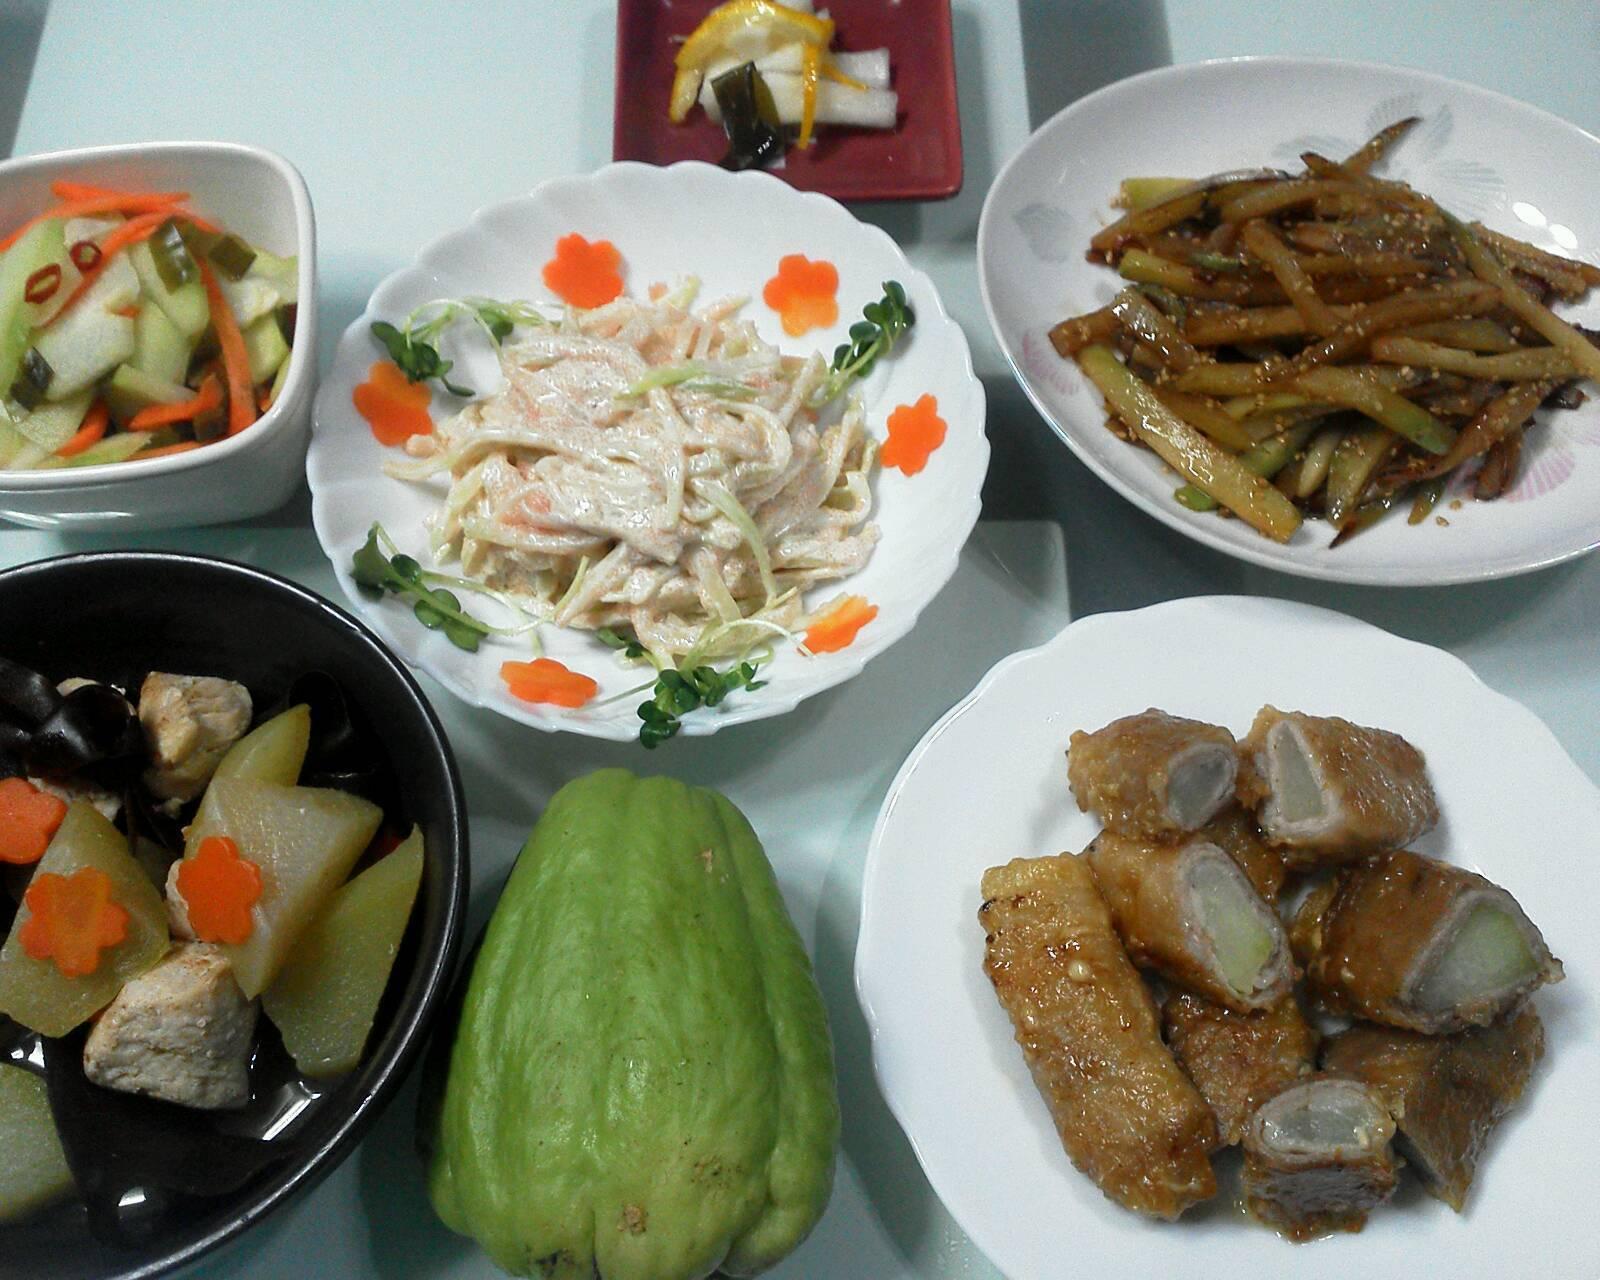 隼人瓜で簡単料理♪_b0236665_23224728.jpg